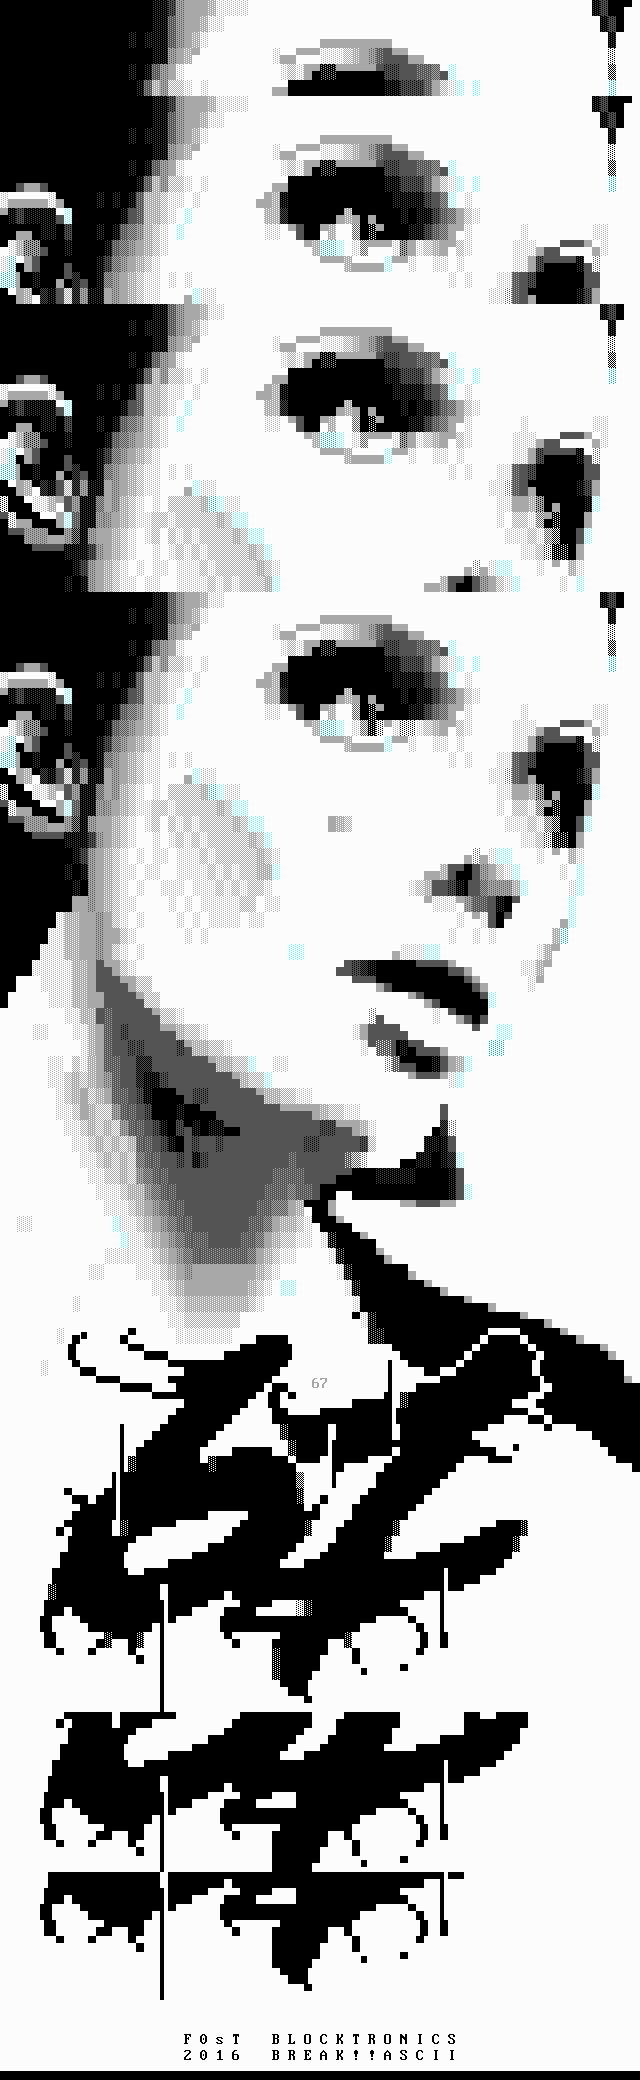 fs-67.xb, portrait, grayscale, greyscale, gray, grey, sexy, woman, girl, eyes, fost, f0st, fs, logo, 67, font, typhography